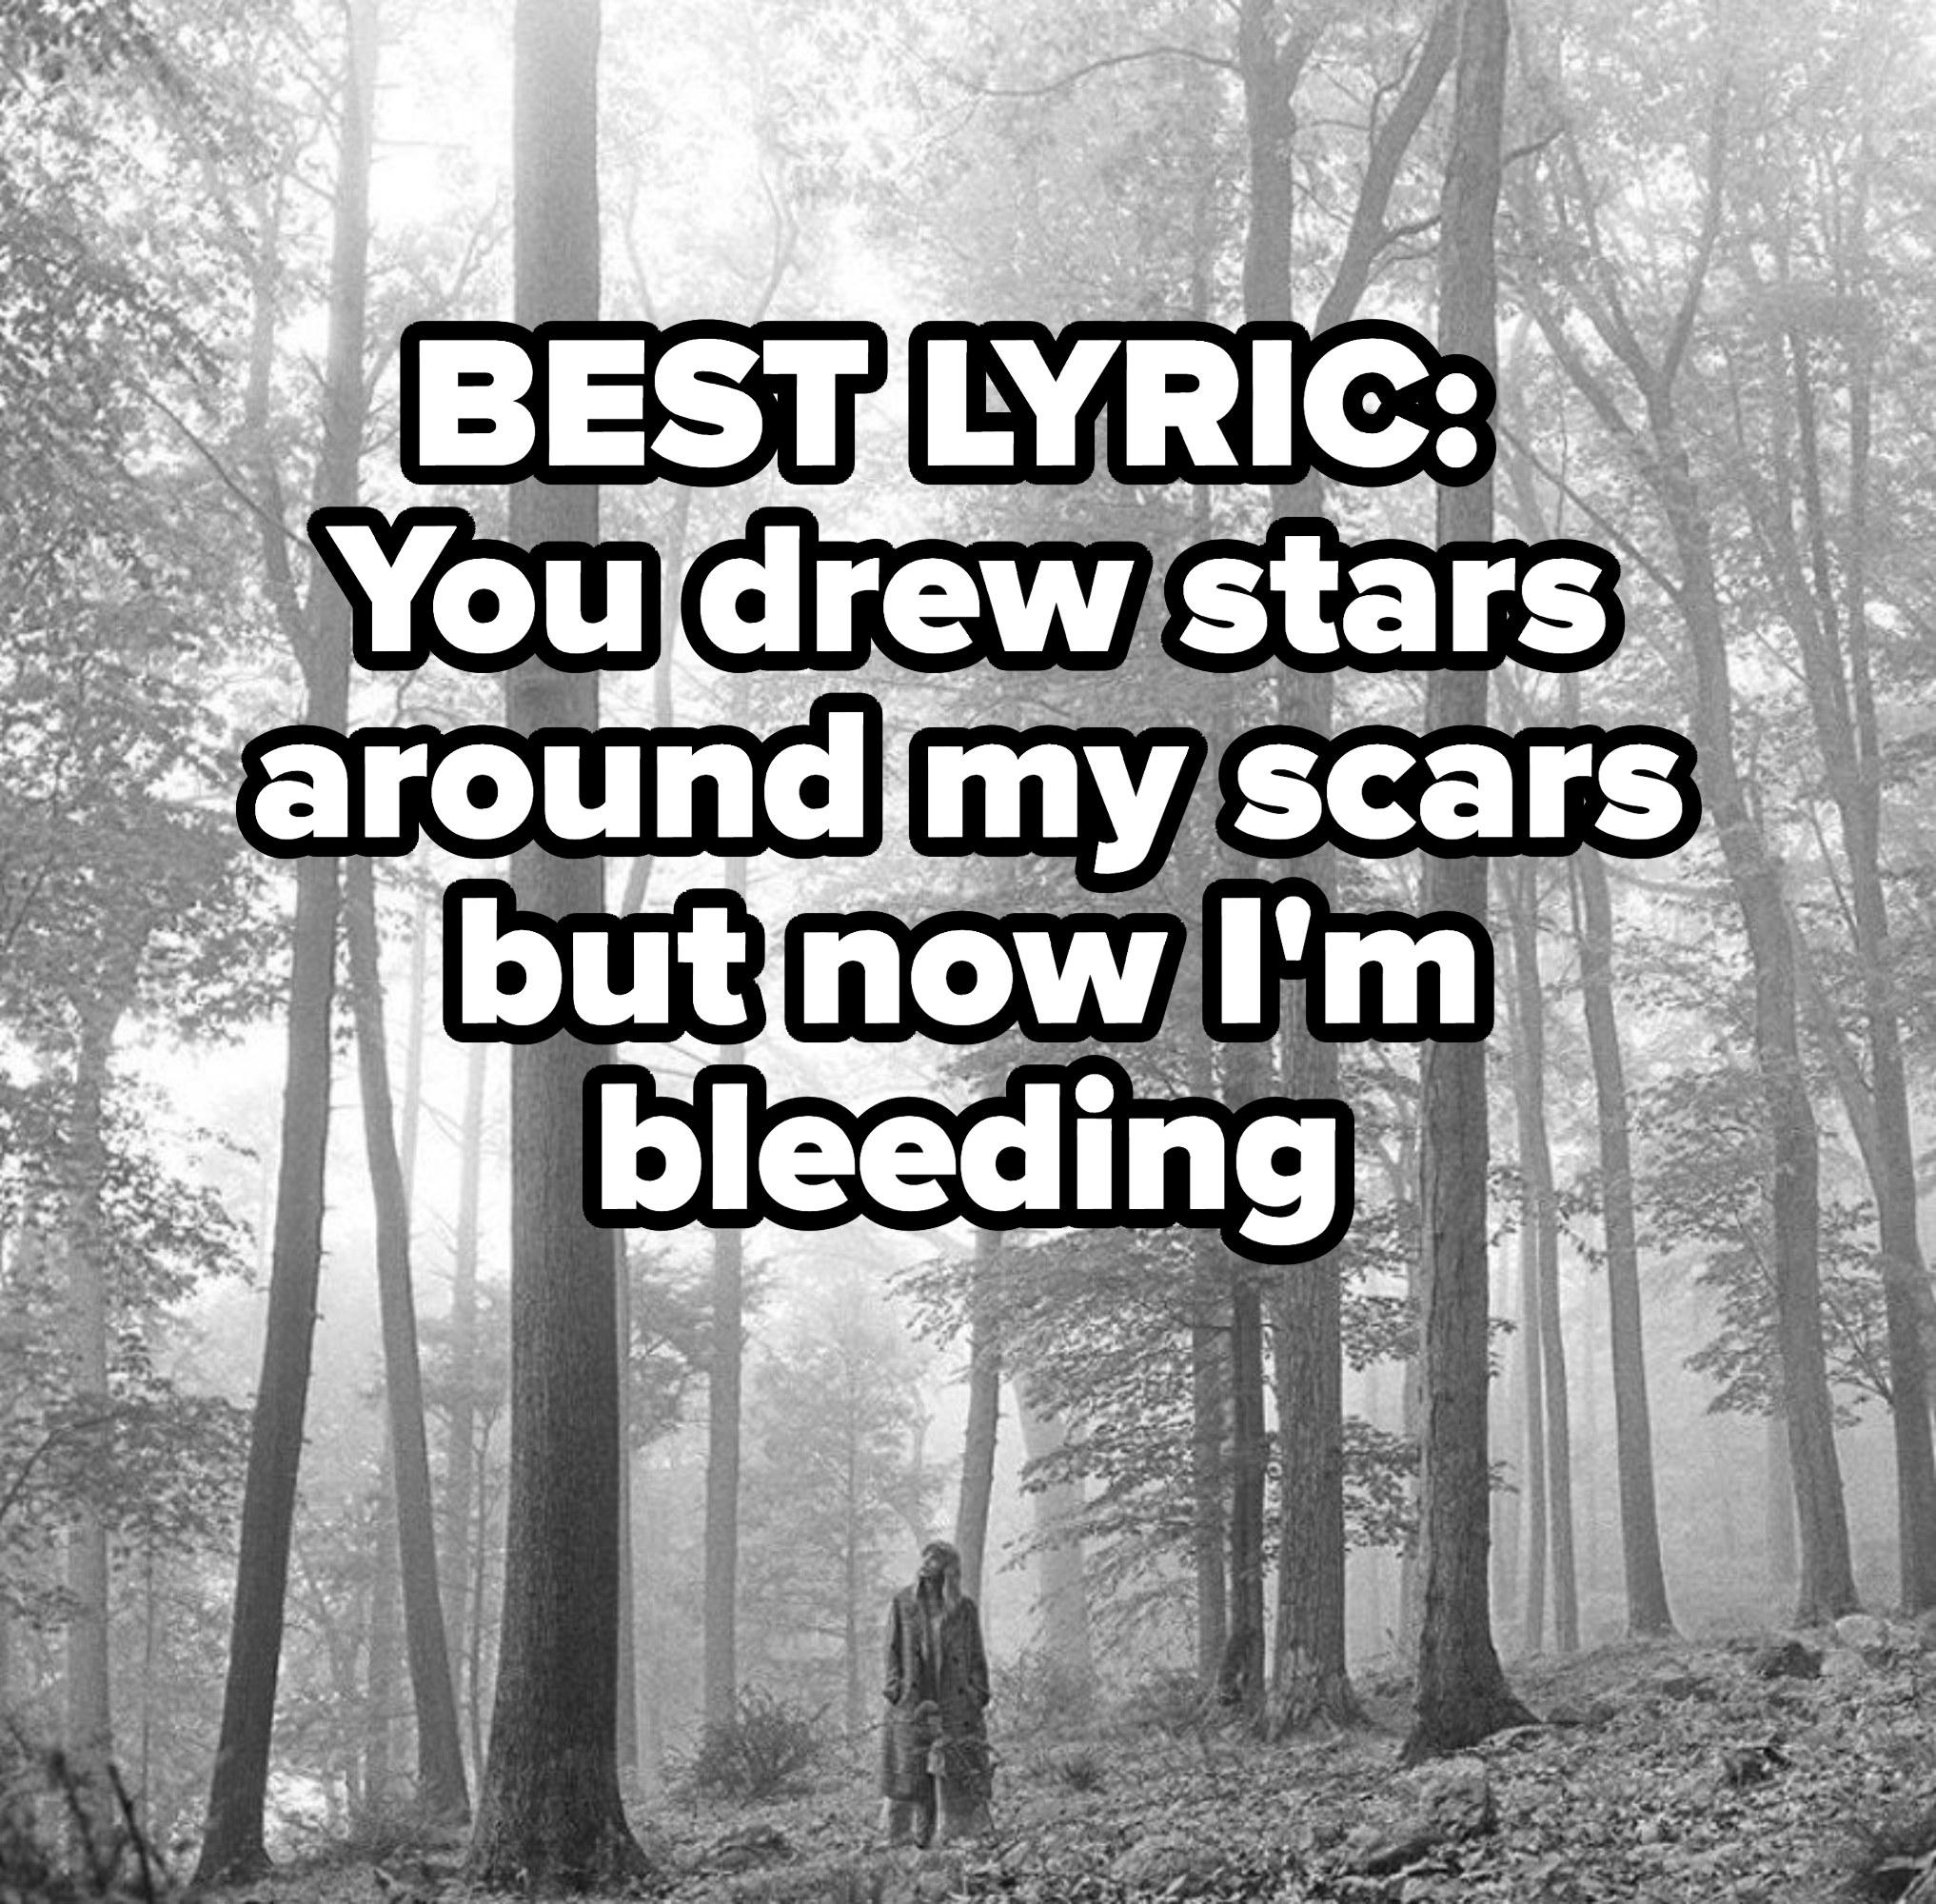 BEST LYRIC: You drew stars around my scars but now I'm bleeding